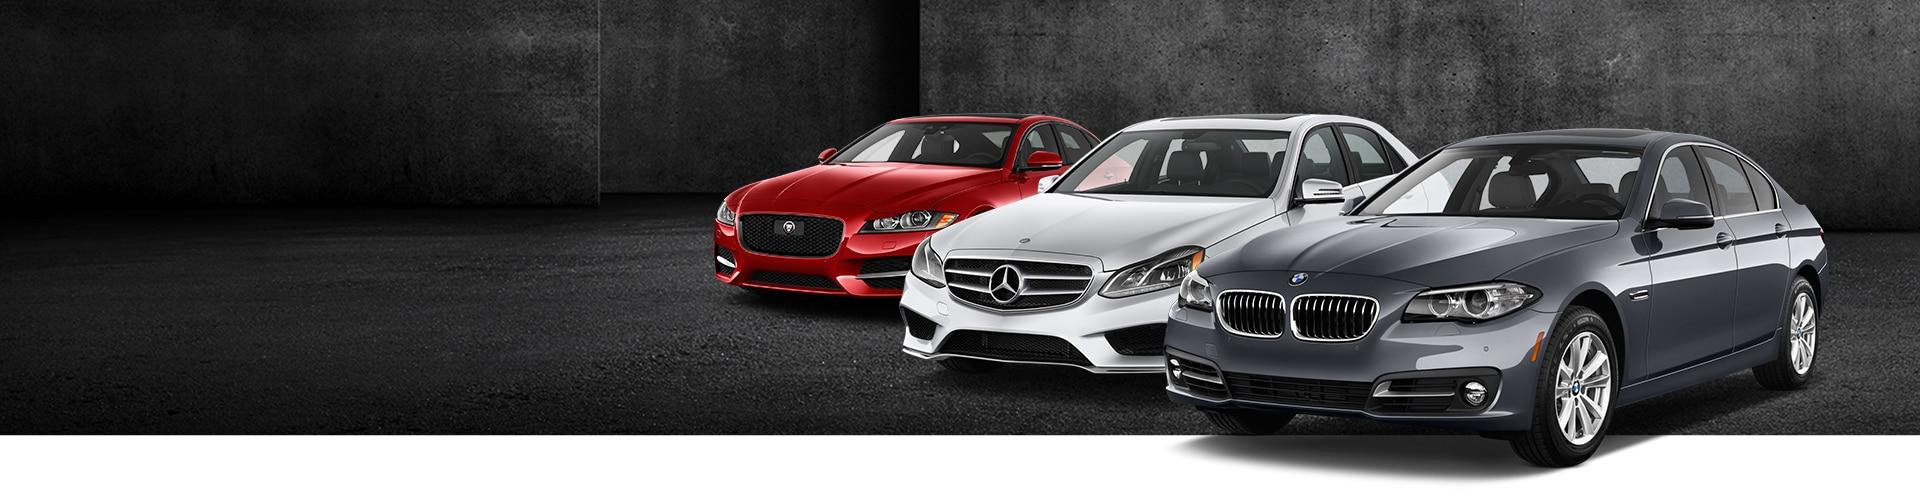 Rent A Premium Elite Car Jaguar Xf Or Similar Enterprise Rent A Car